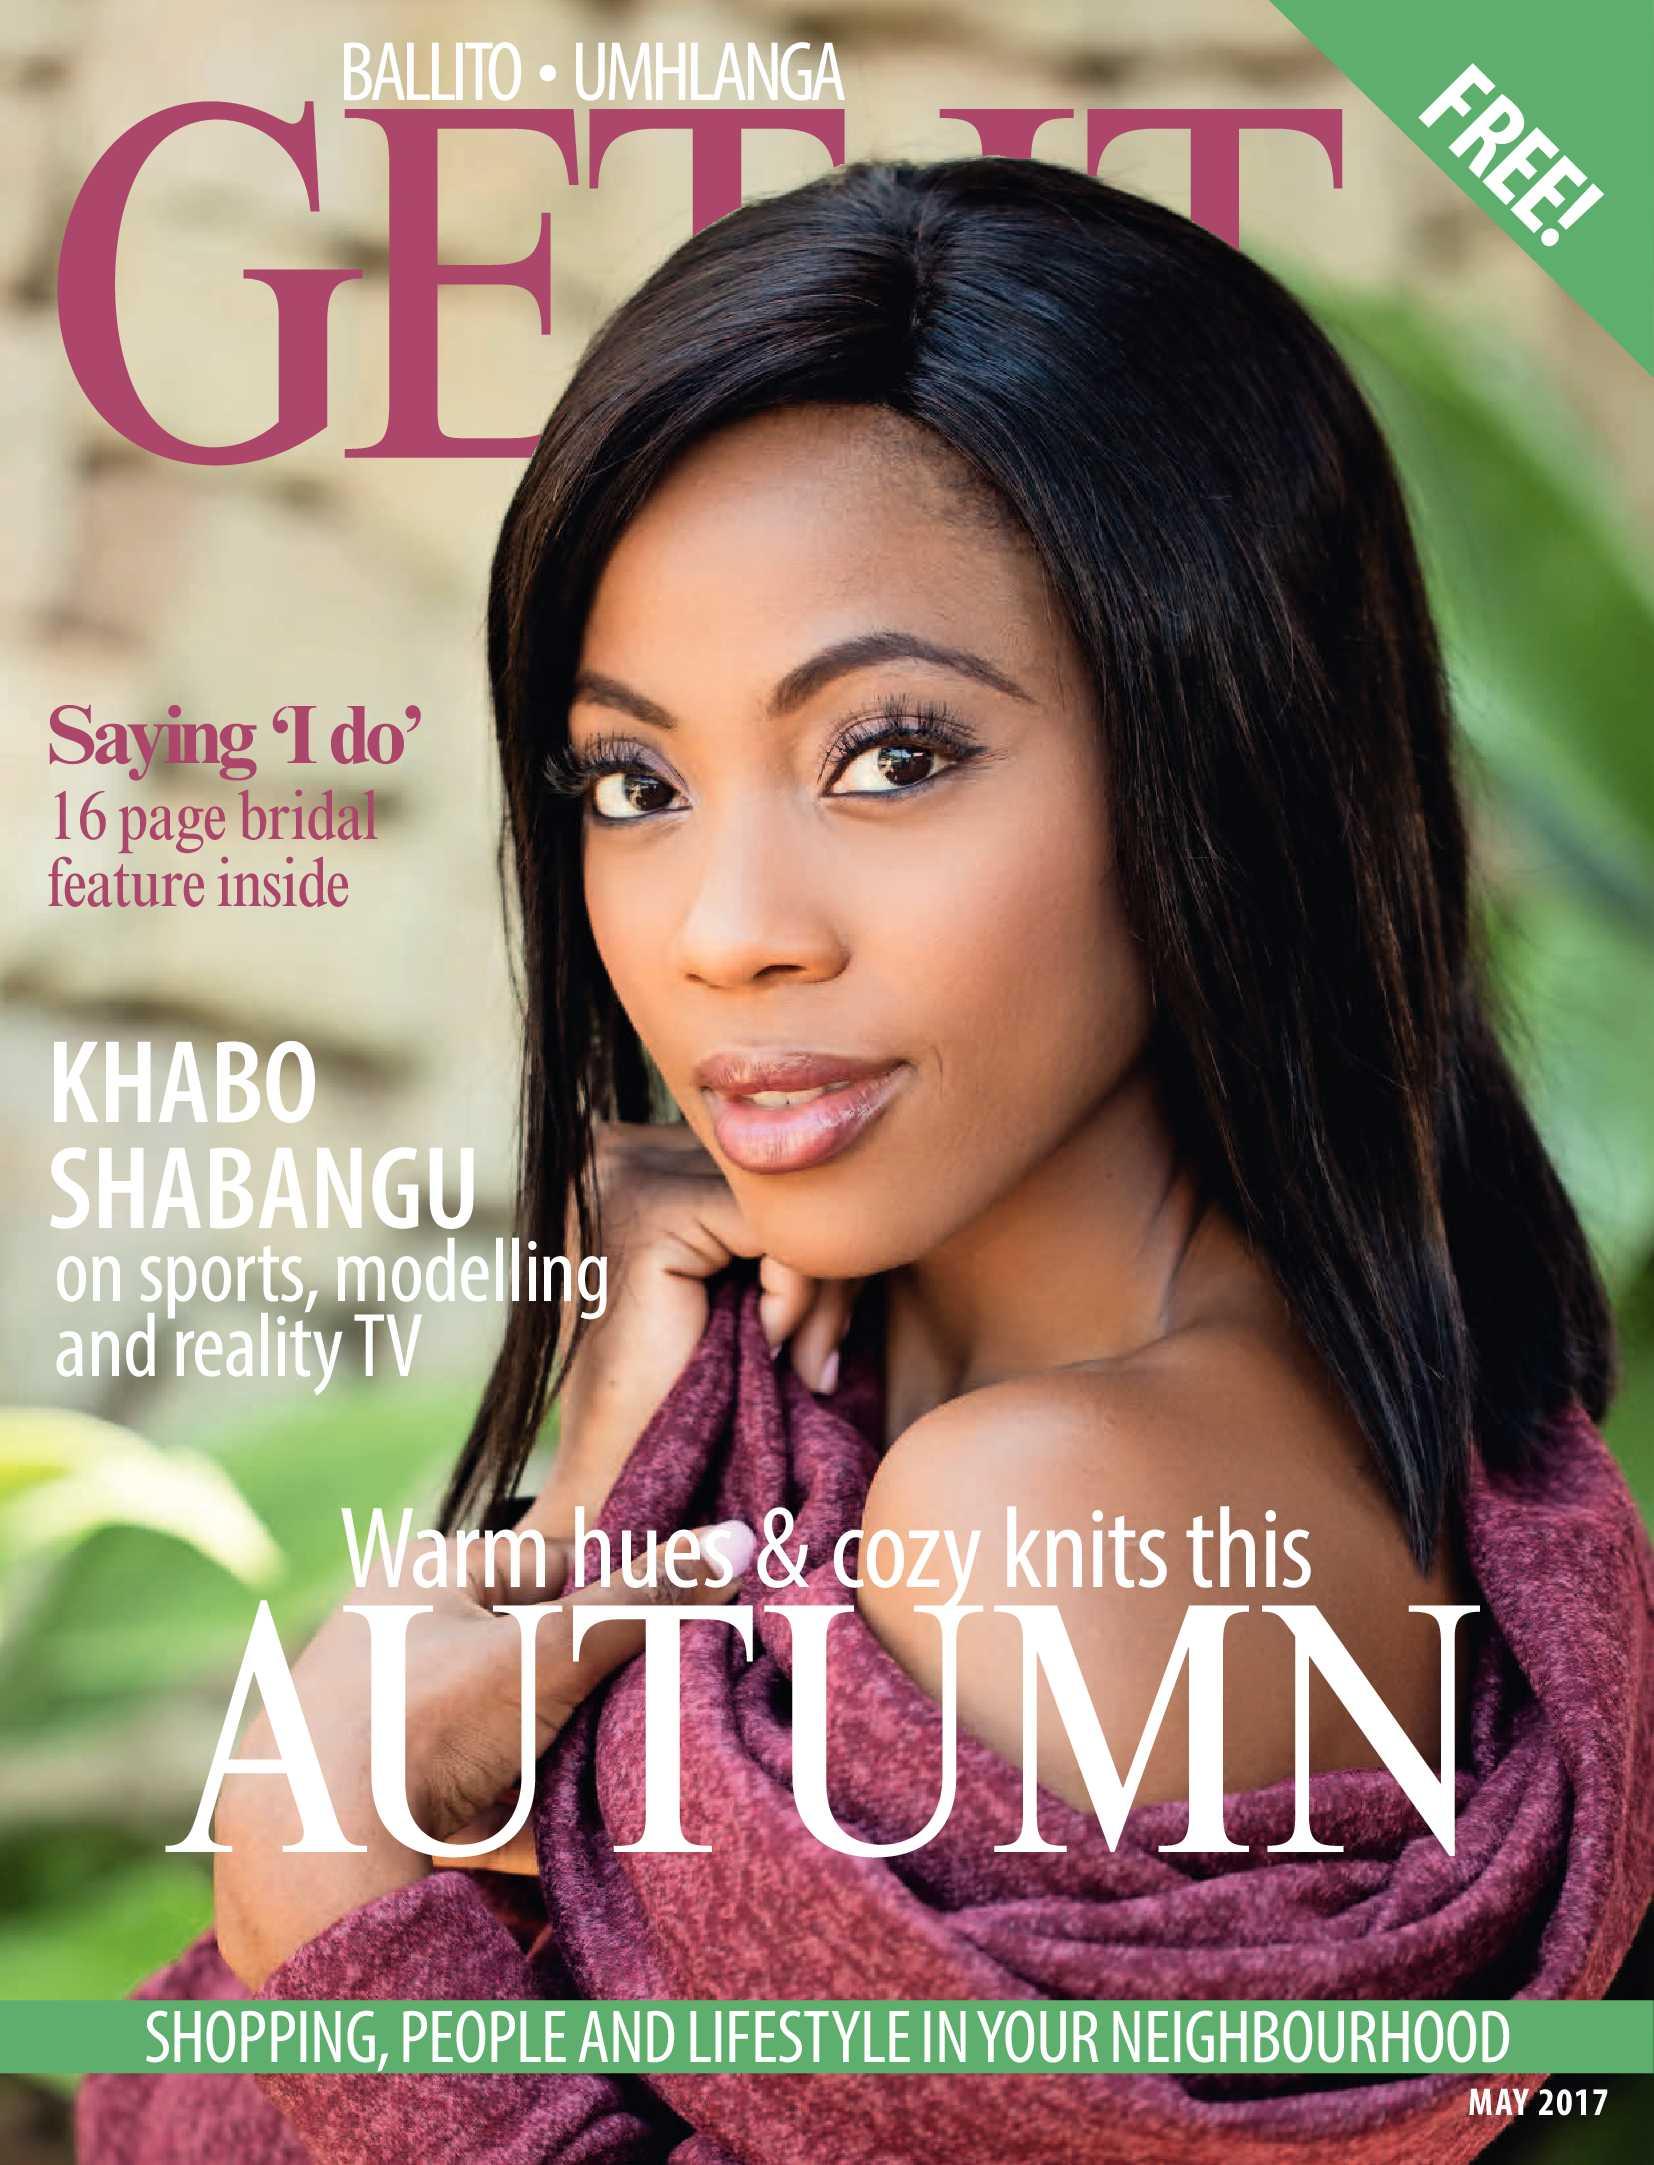 get-magazine-ballitoumhlanga-may-2017-epapers-page-1